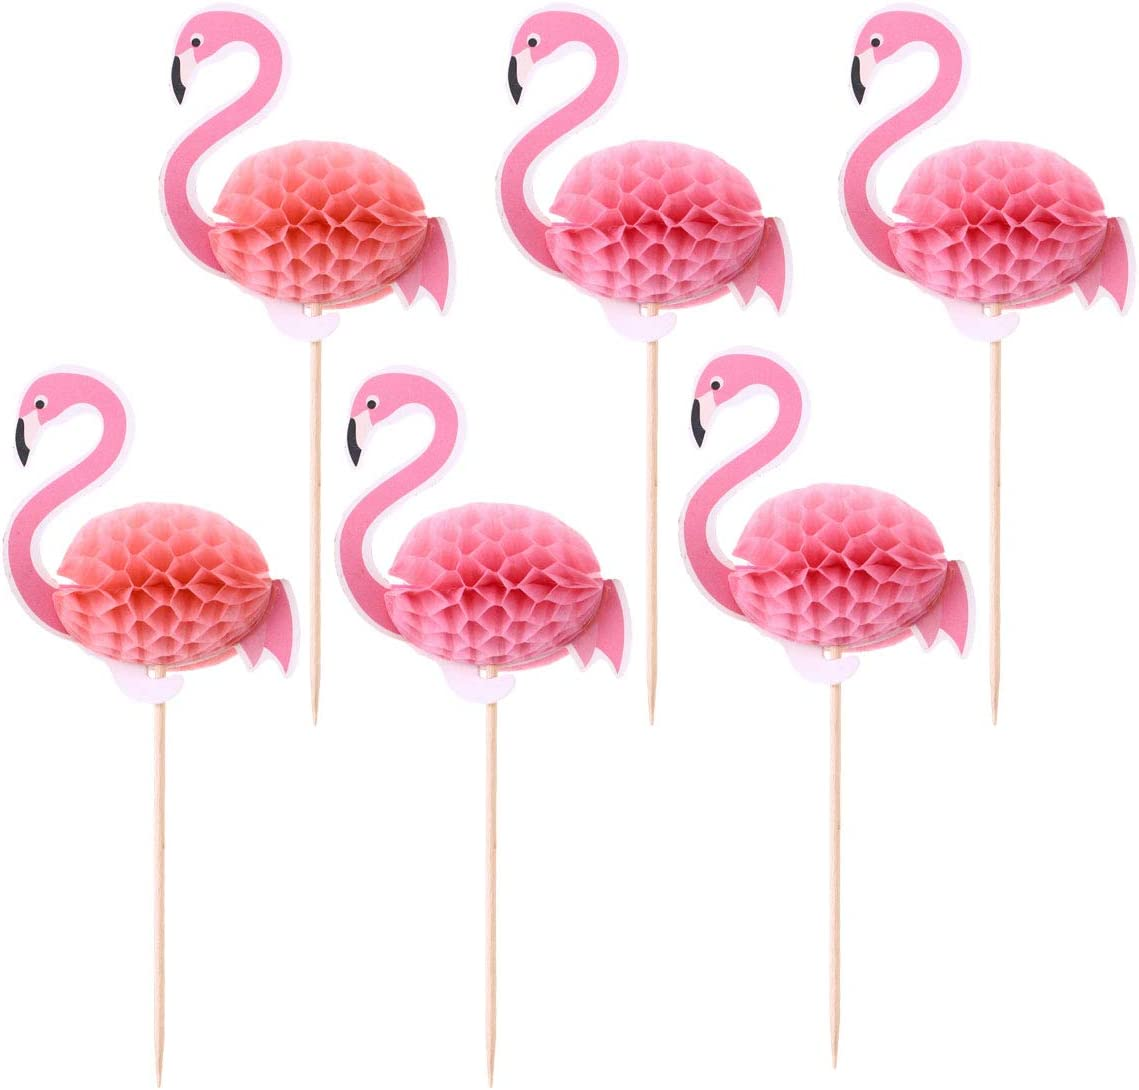 Liwein 30 pcs Flamingo Cupcake Toppers,3D Cake Toppers Pavo Real Goldfish Cartoon Cake Picks Toothpicks Suministros de Decoraci/ón de Alimentos para Cocktail Fiesta de Cumplea/ños Bodas